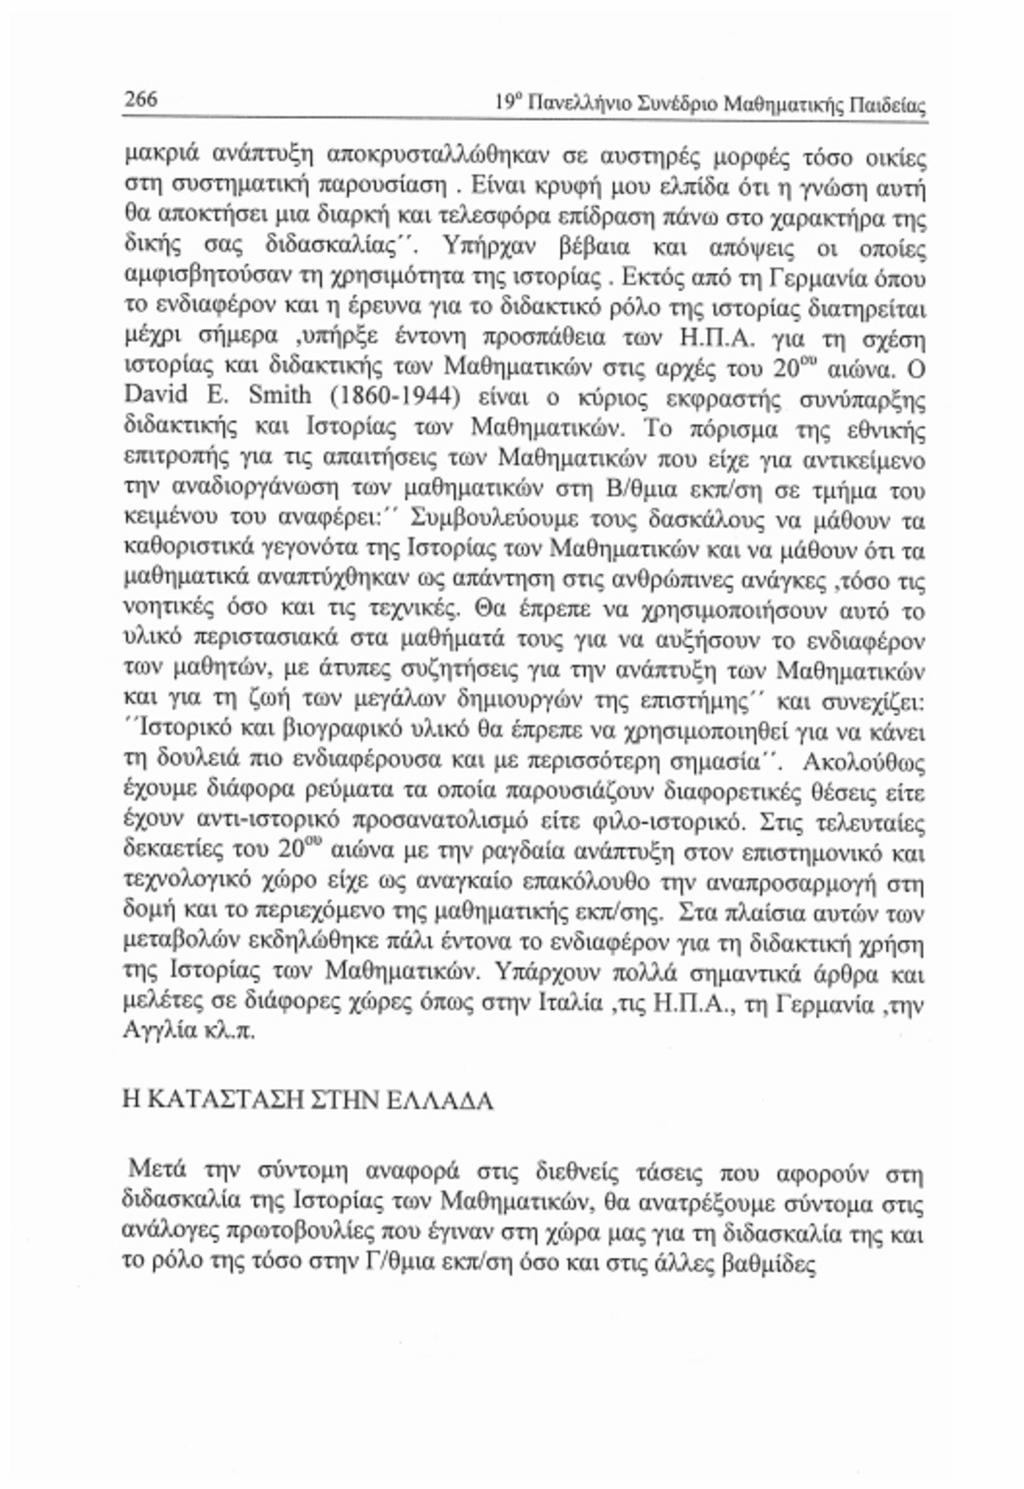 1dc5be3abd Εισήγηση 21  Μαθηματικά-ιστορική εξέλιξη ο ρόλος της Ιστορίας των ...